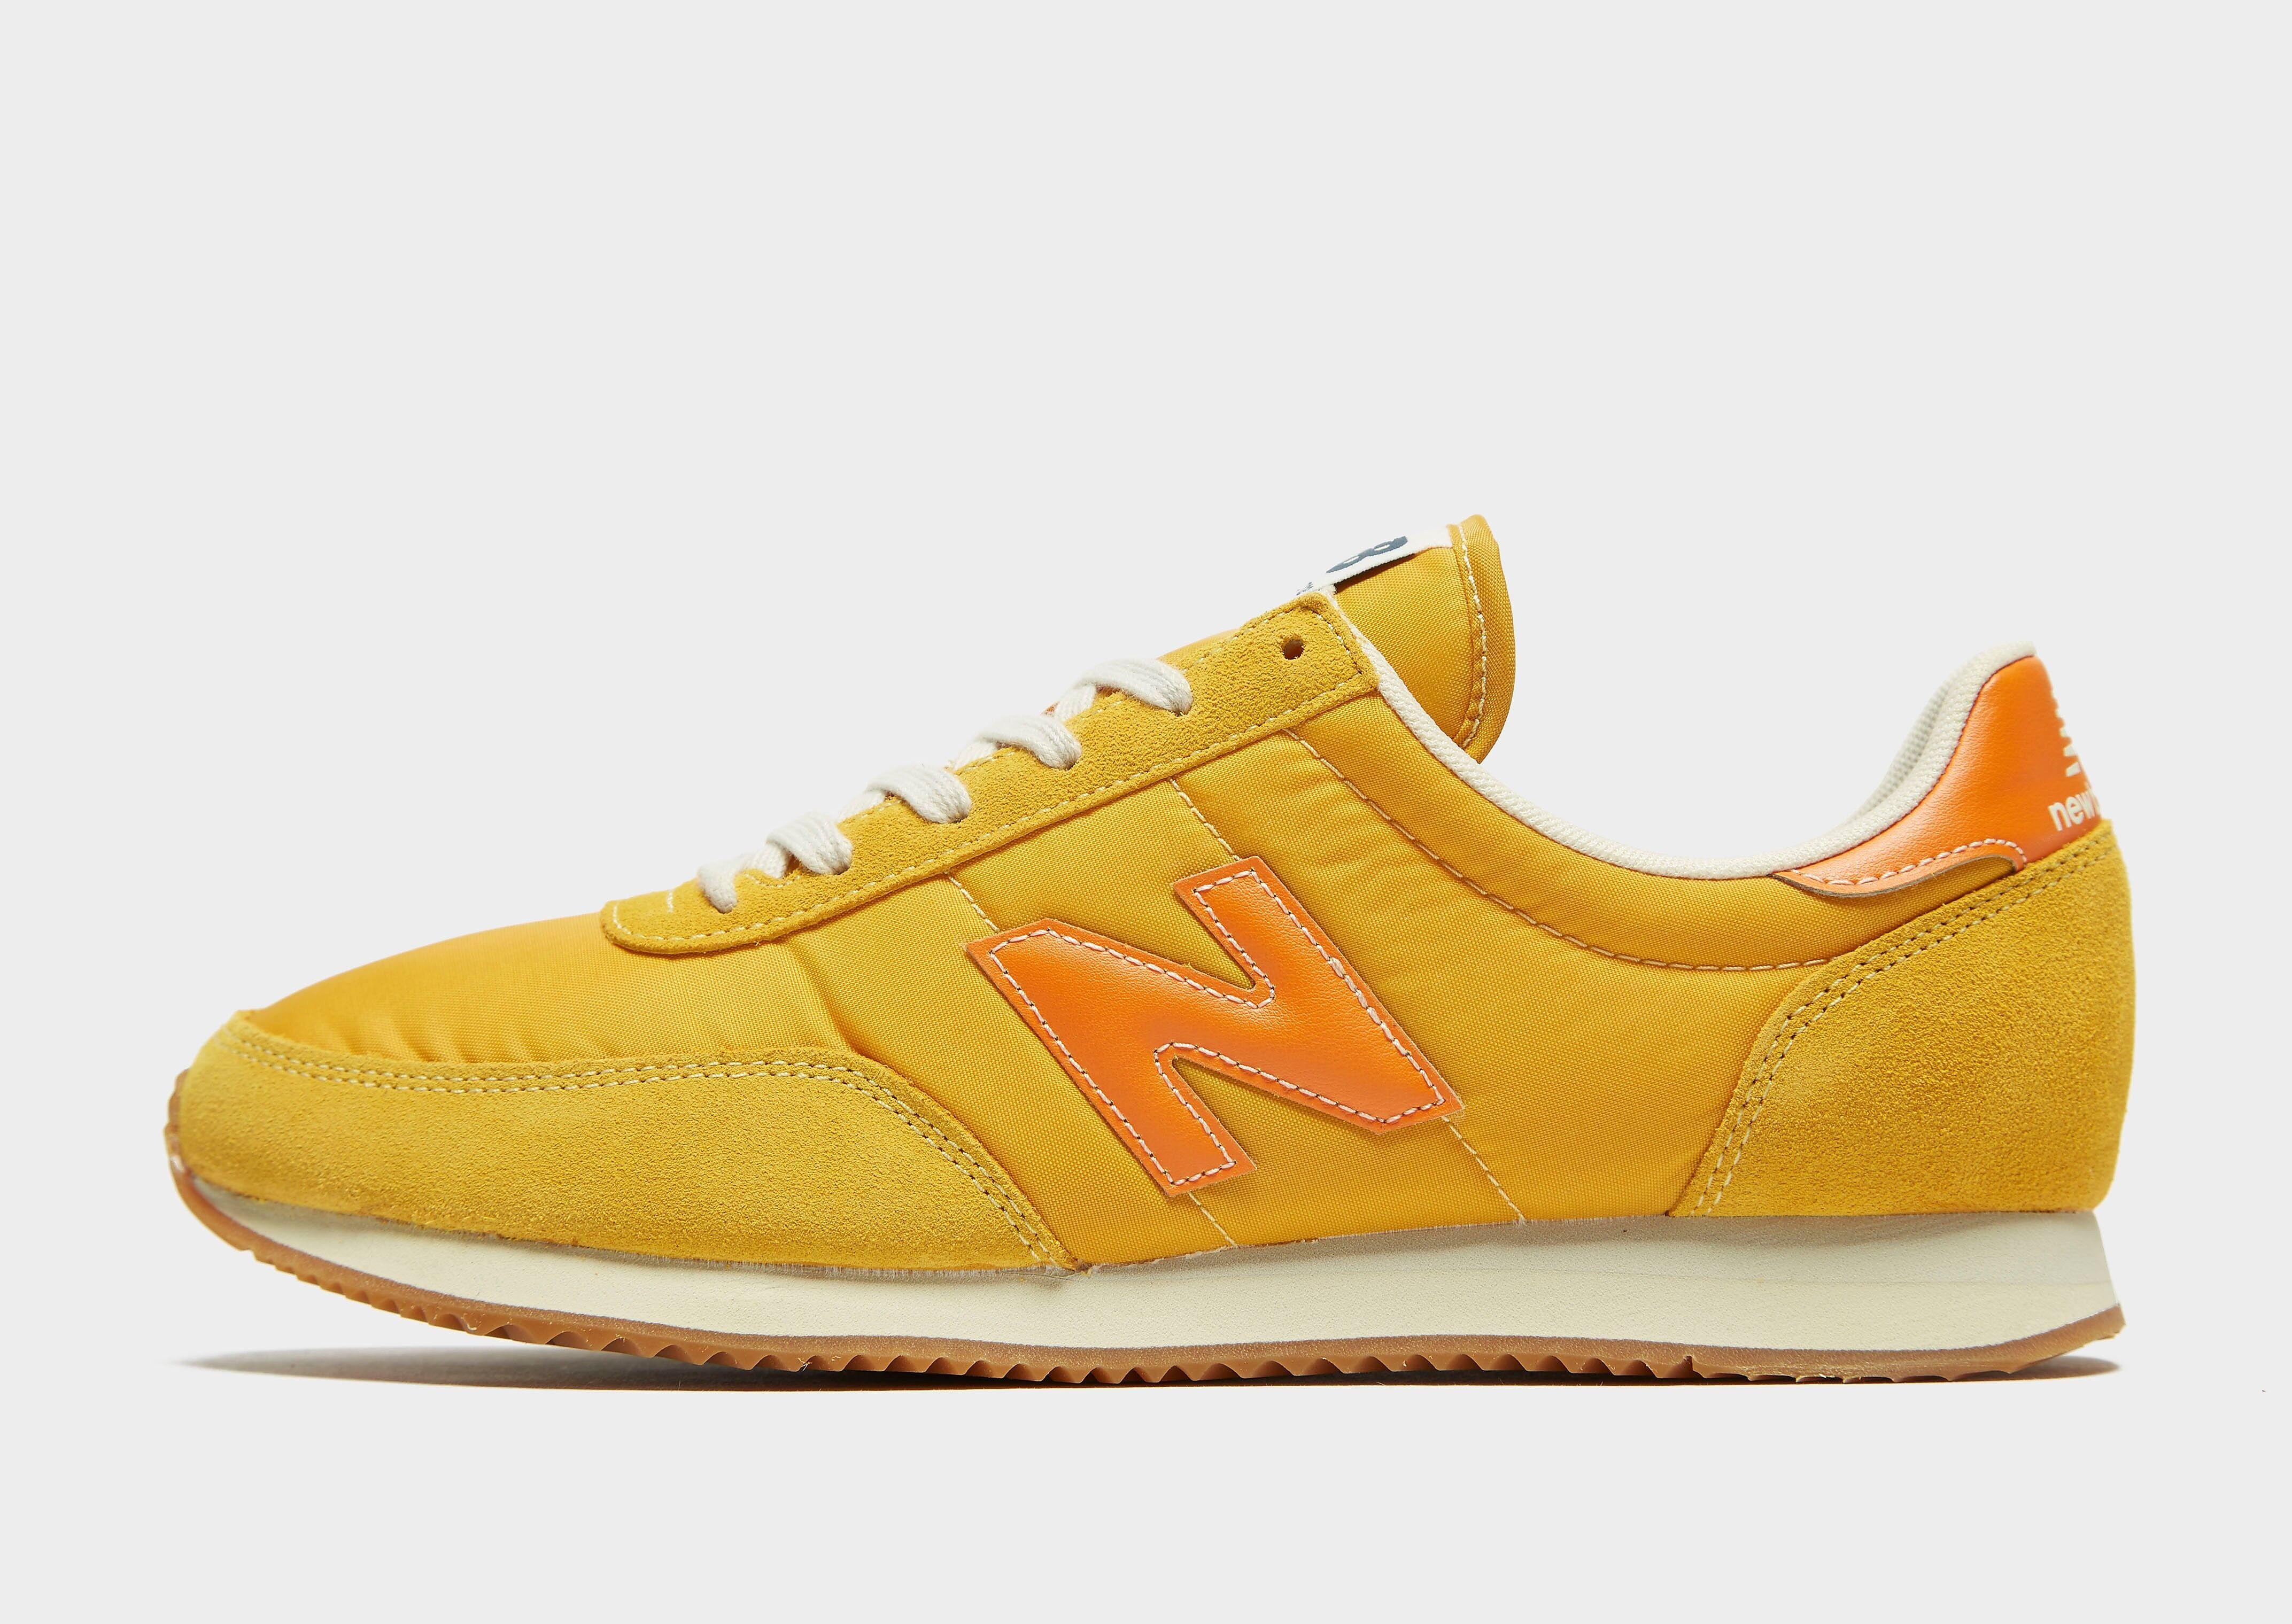 New Balance 720 - Mens, Keltainen